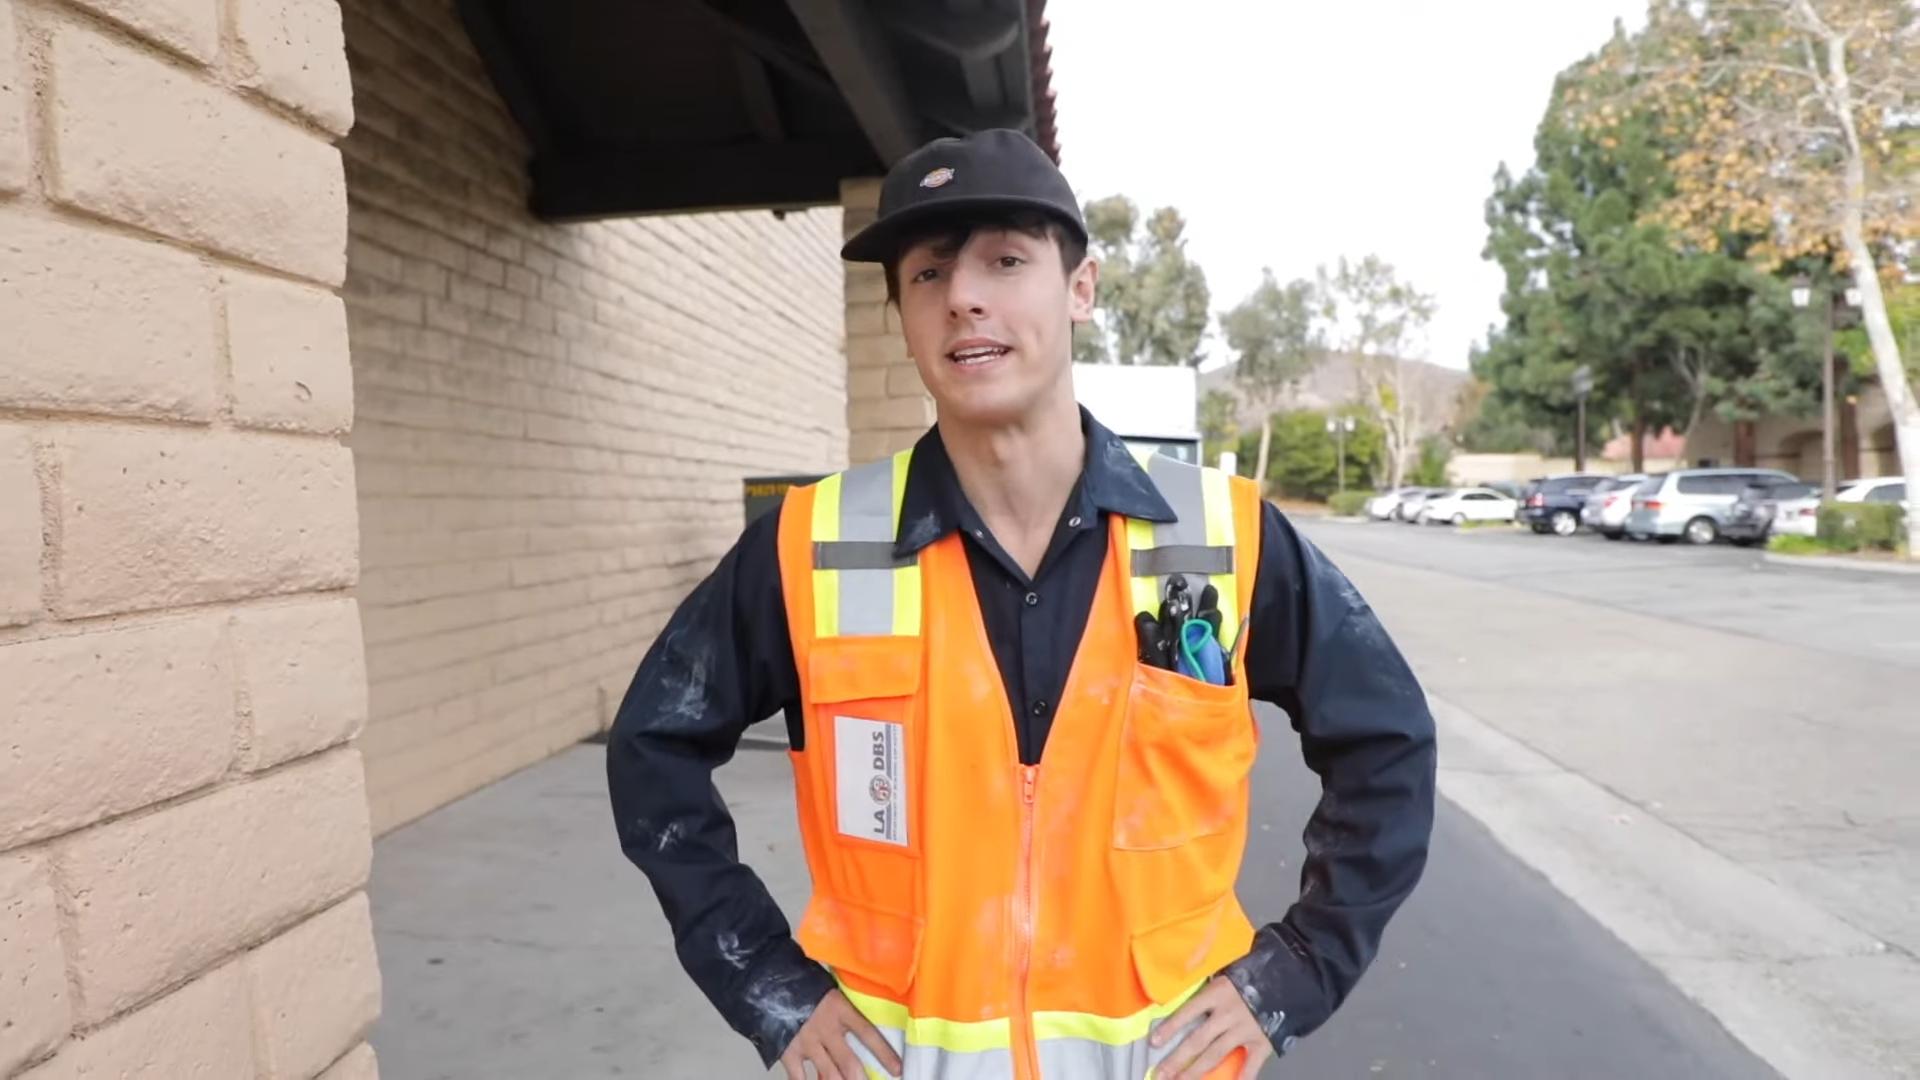 Bryce Hall wearing high vis vest